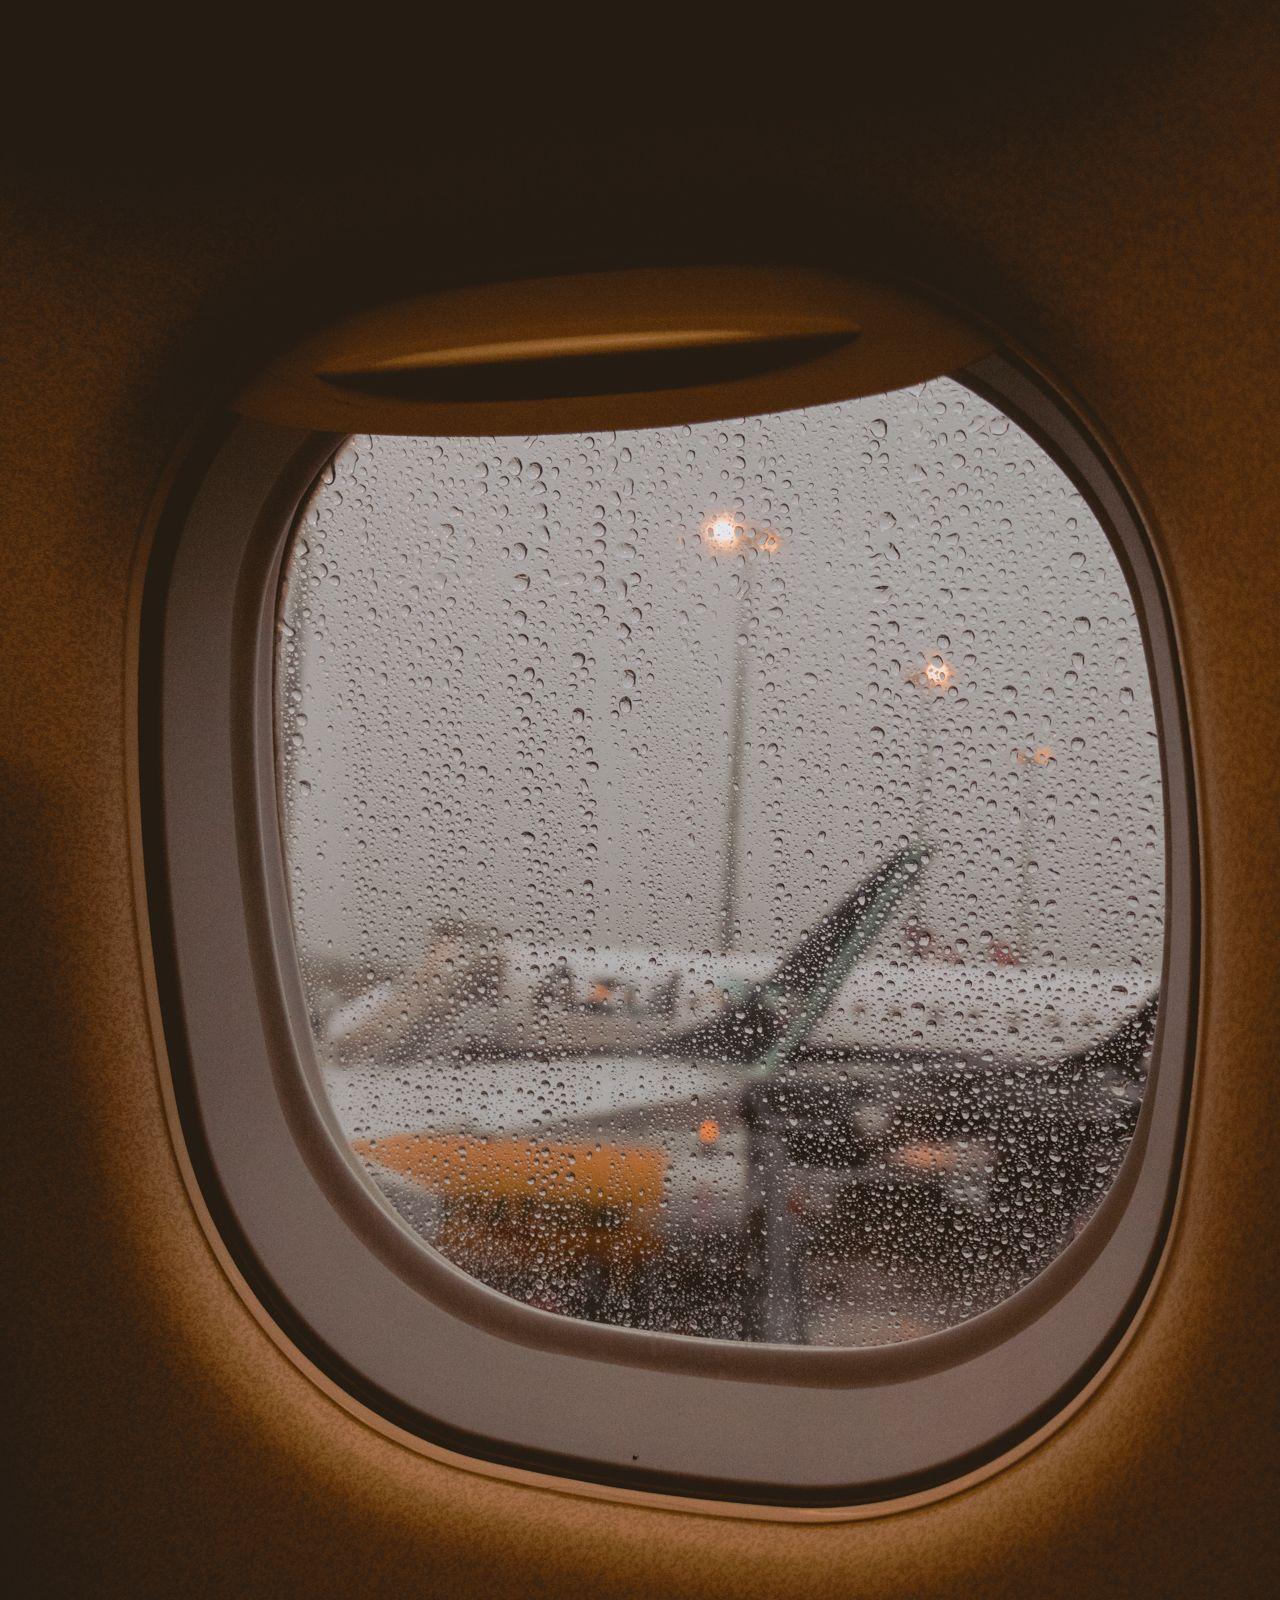 janela avião molhada